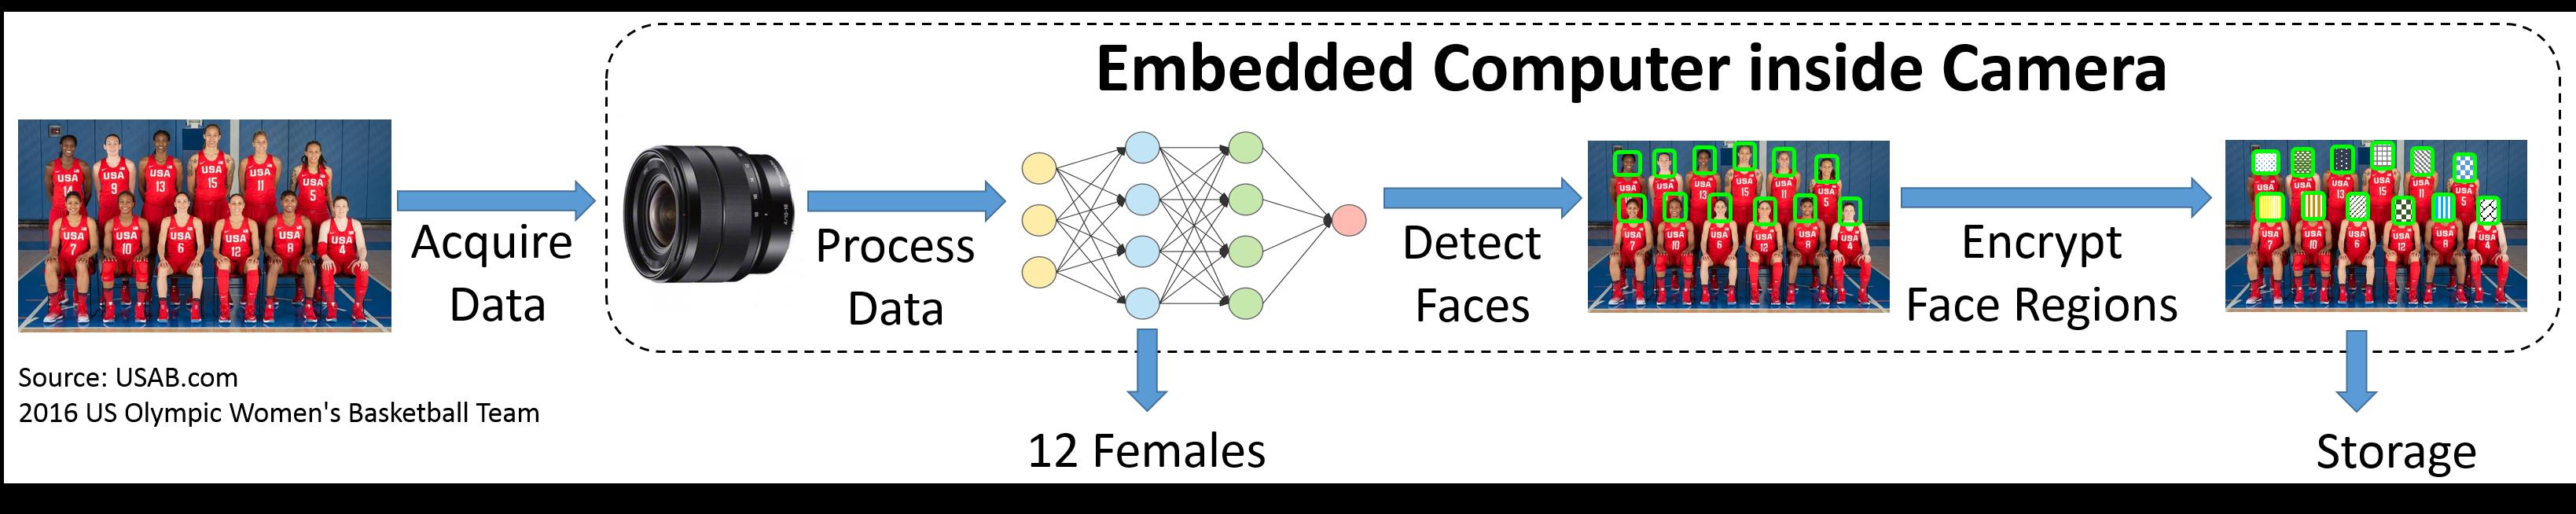 embeddedprivacy